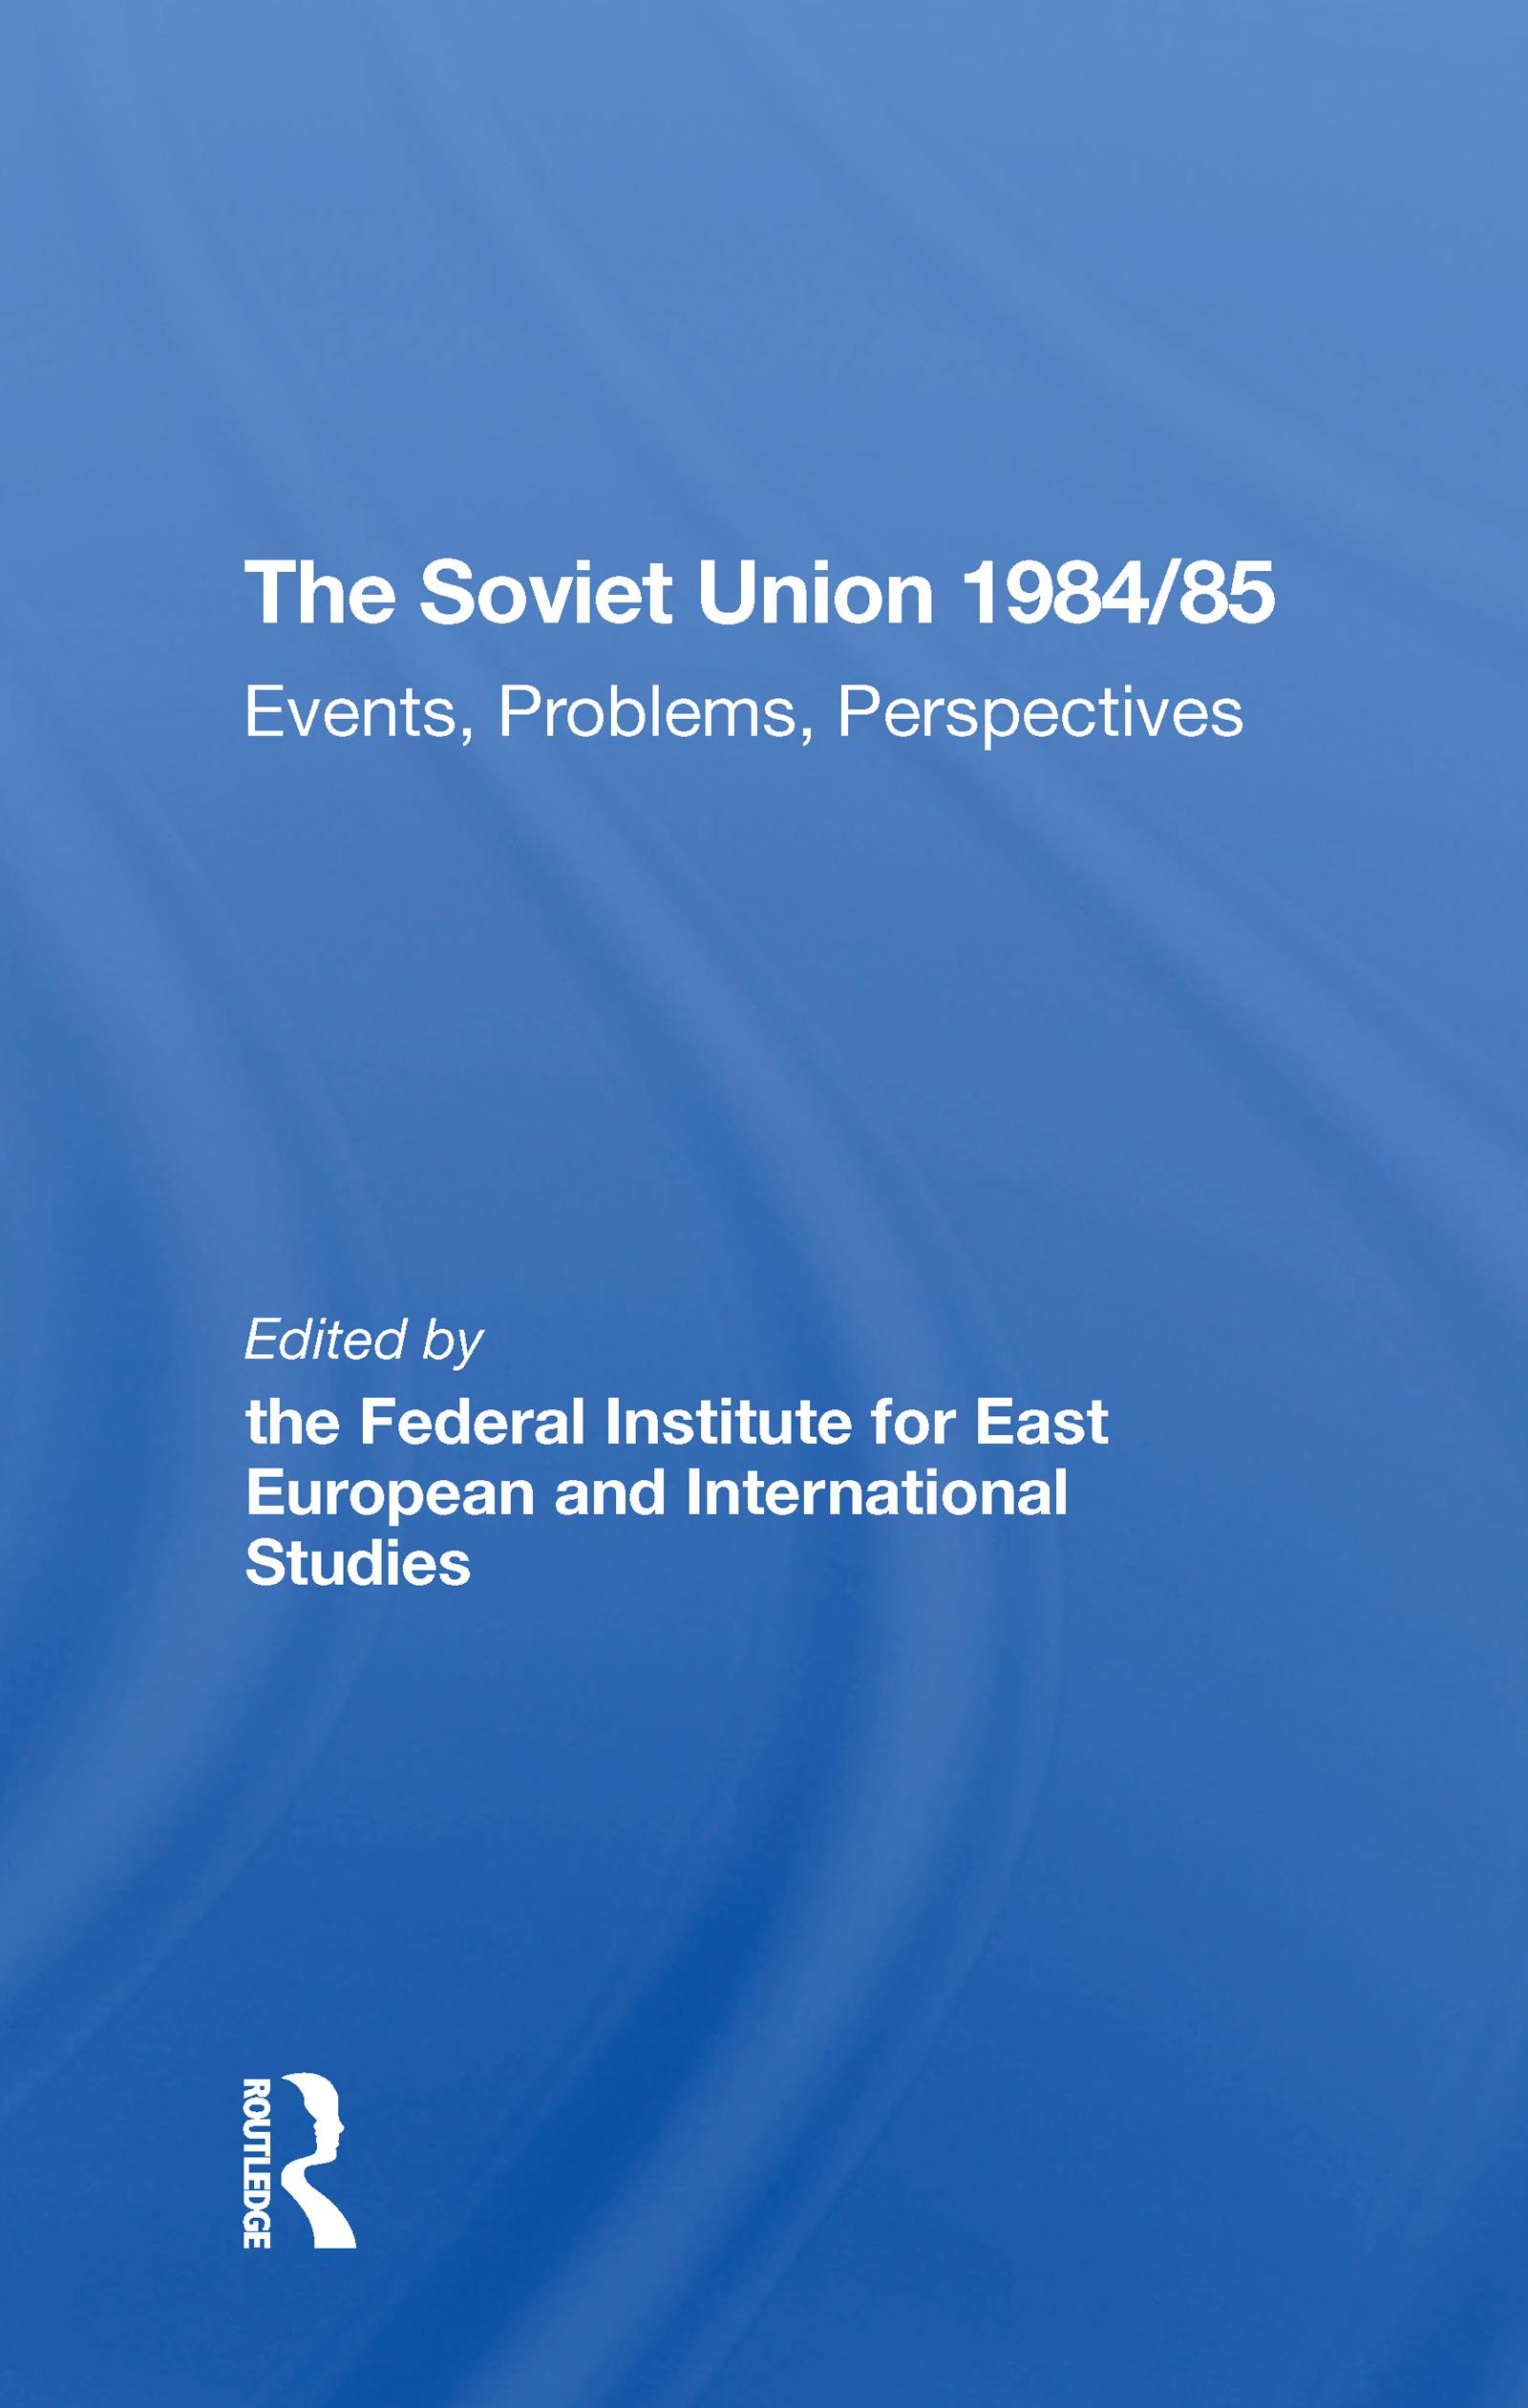 The Soviet Union 1984/85